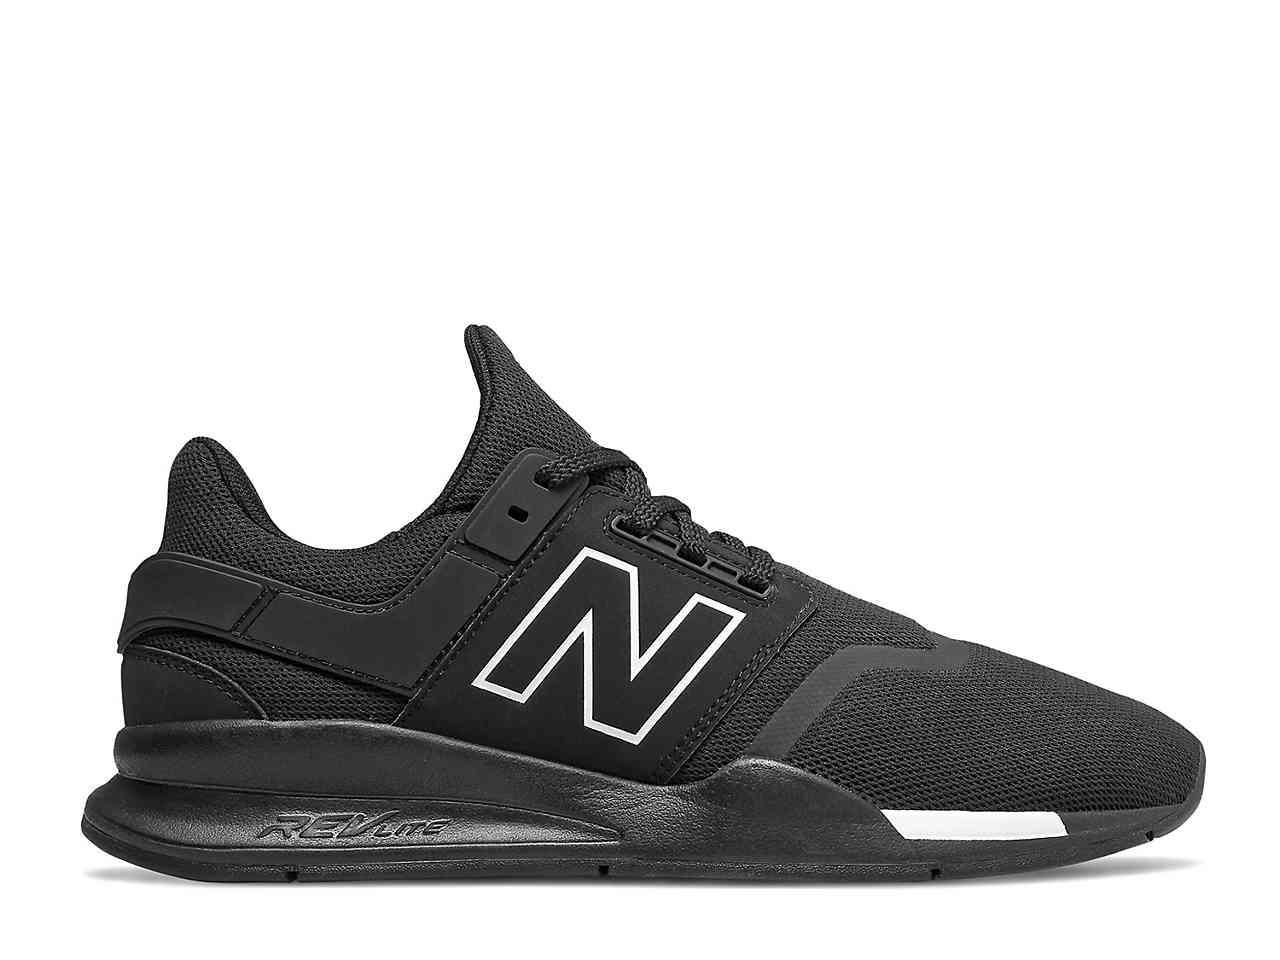 New Balance Synthetic 247 V2 Sneaker in nb Navy/Bone (Black) for ...